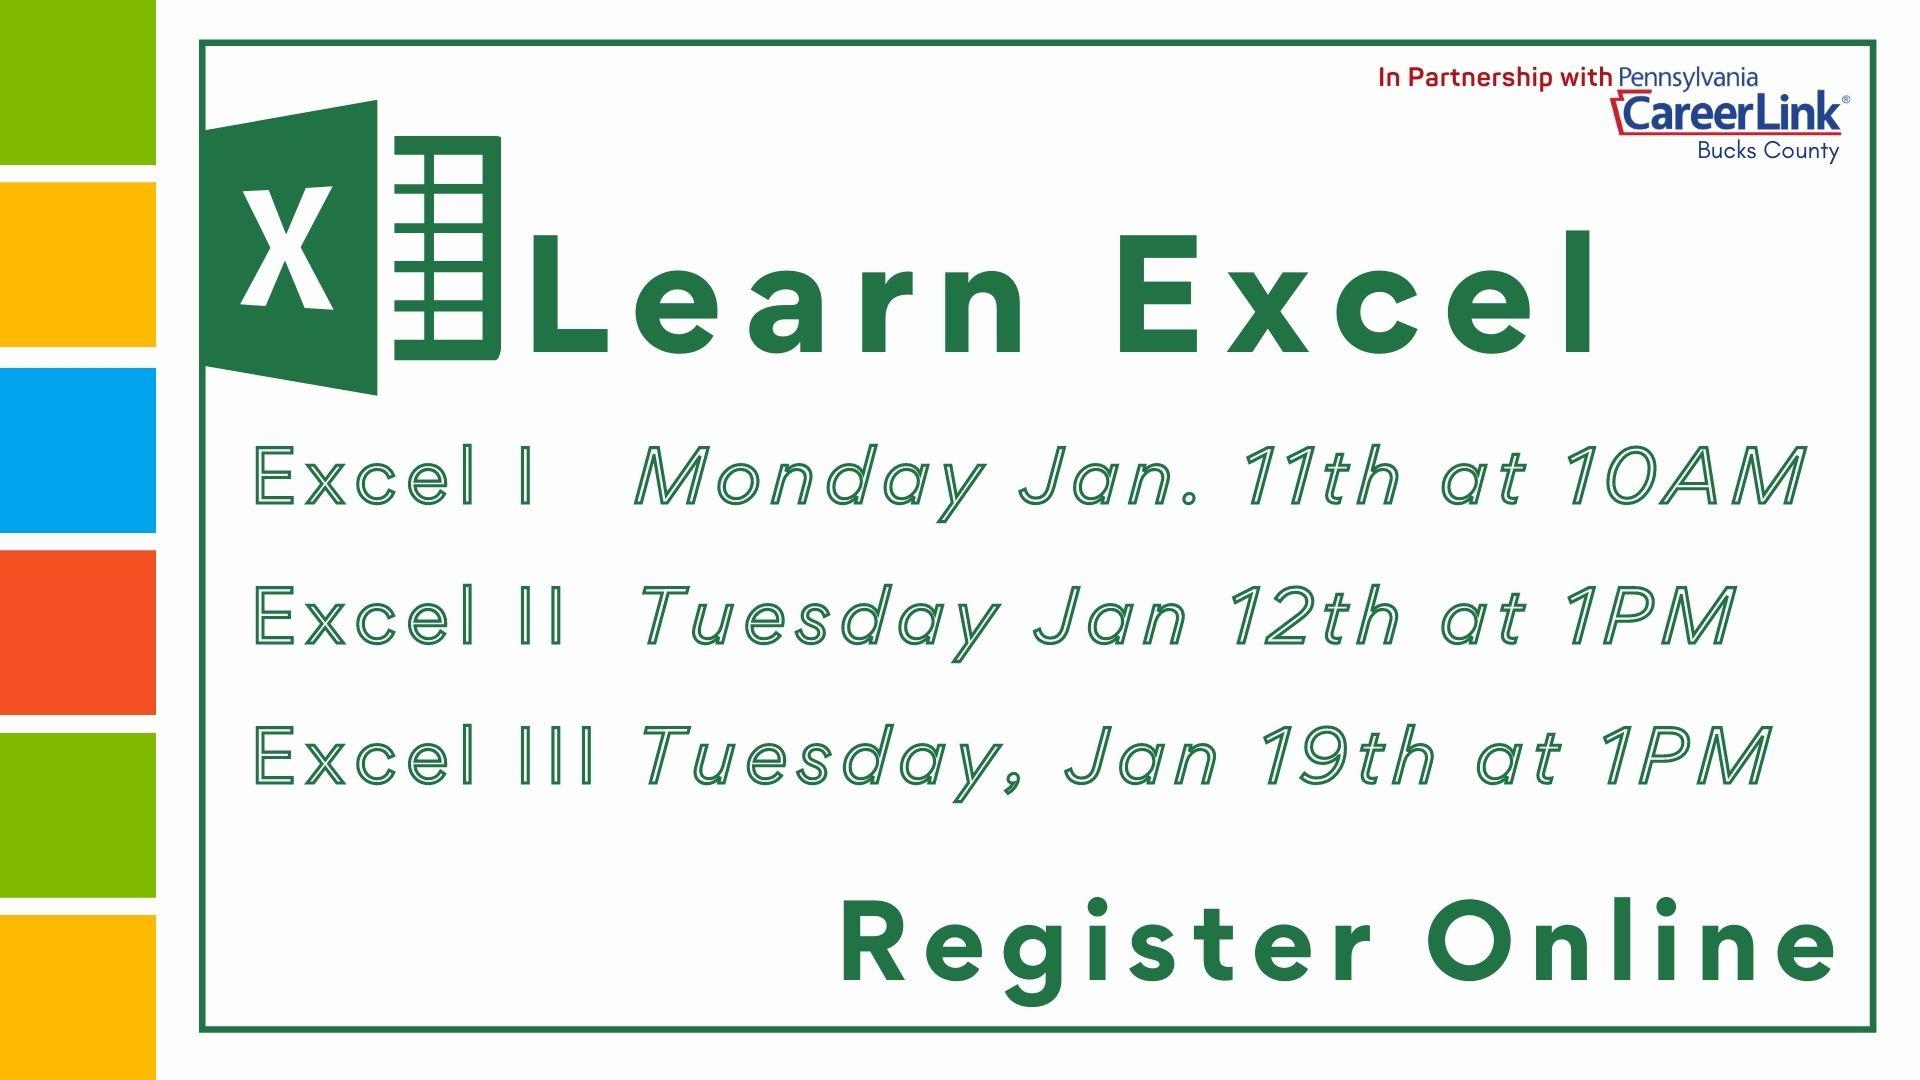 PA CareerLink: Learning Excel III